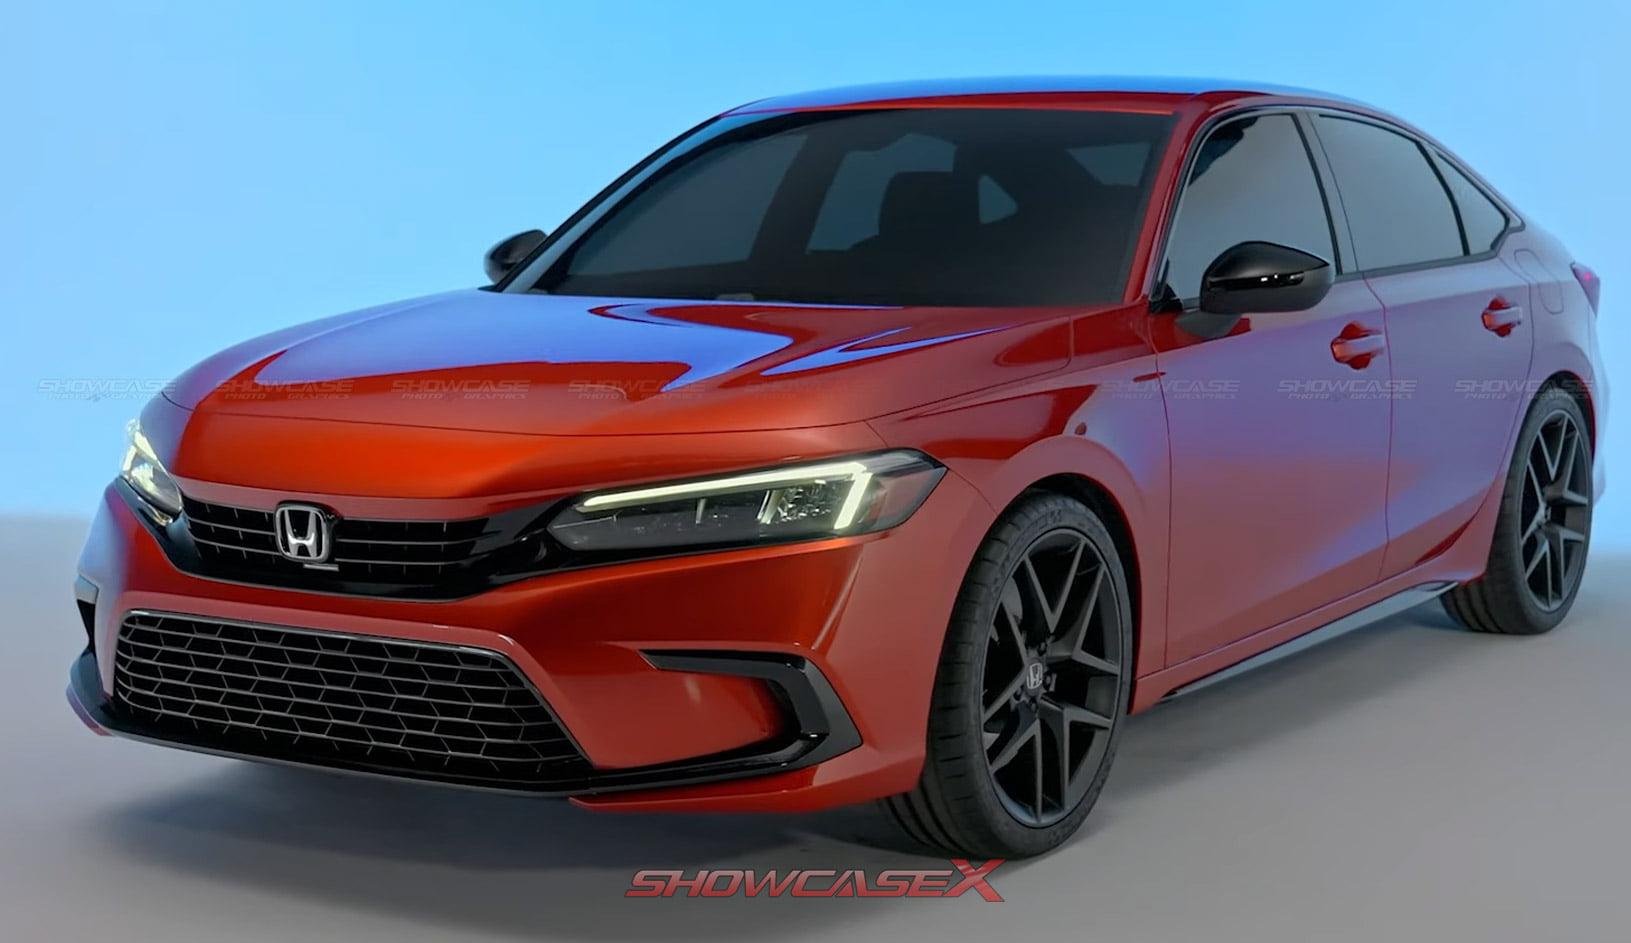 Kelebihan Kekurangan Harga Mobil Civic 2019 Top Model Tahun Ini